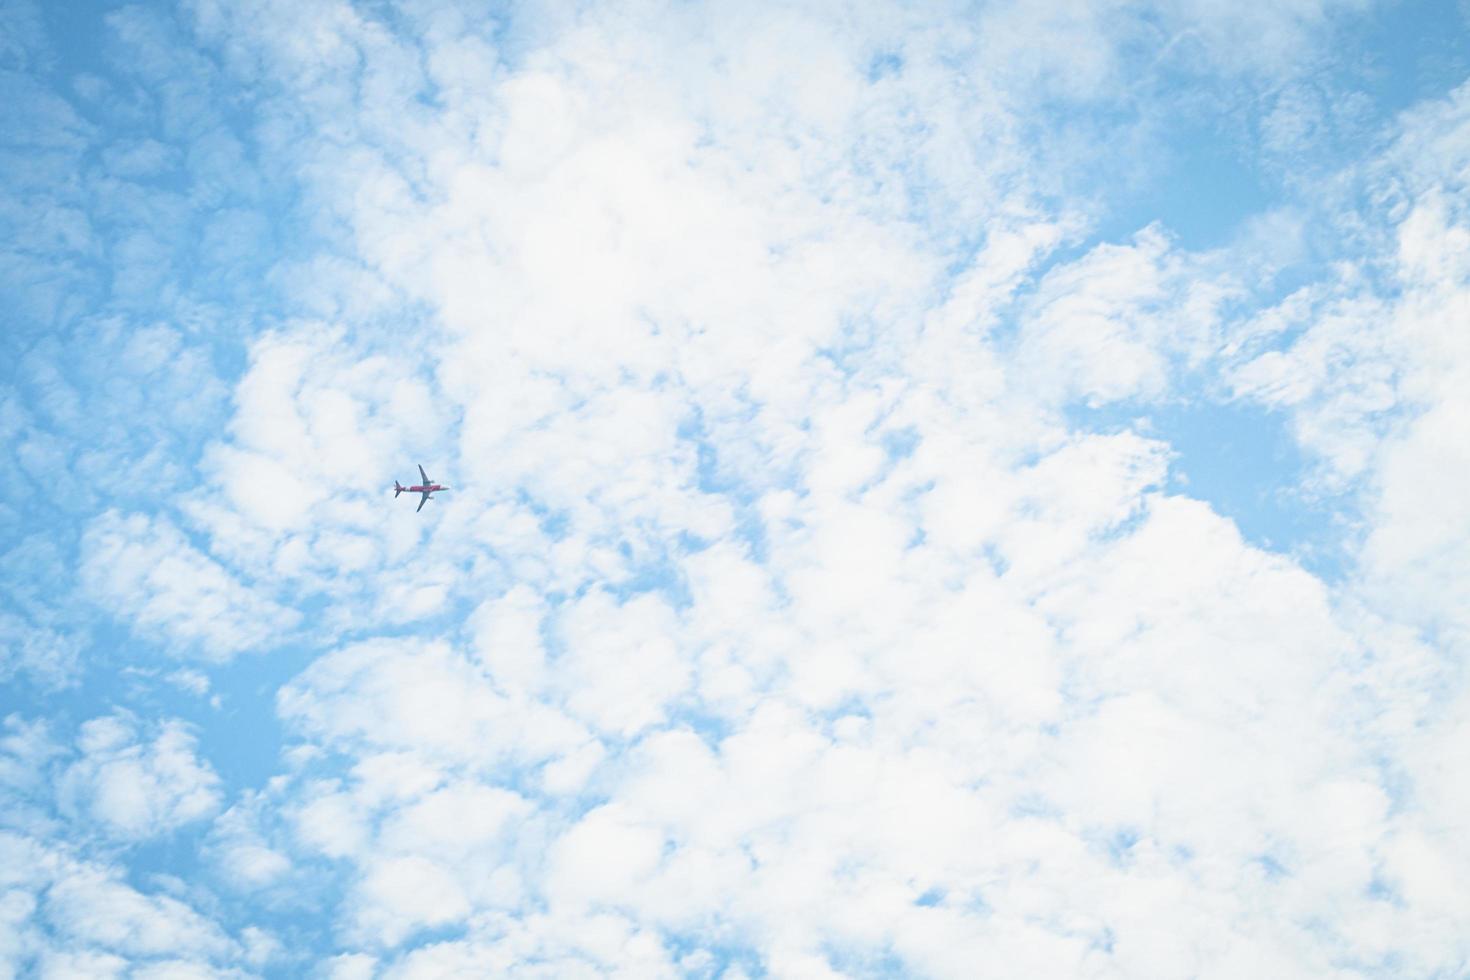 blauwe hemelachtergrond met witte wolken foto